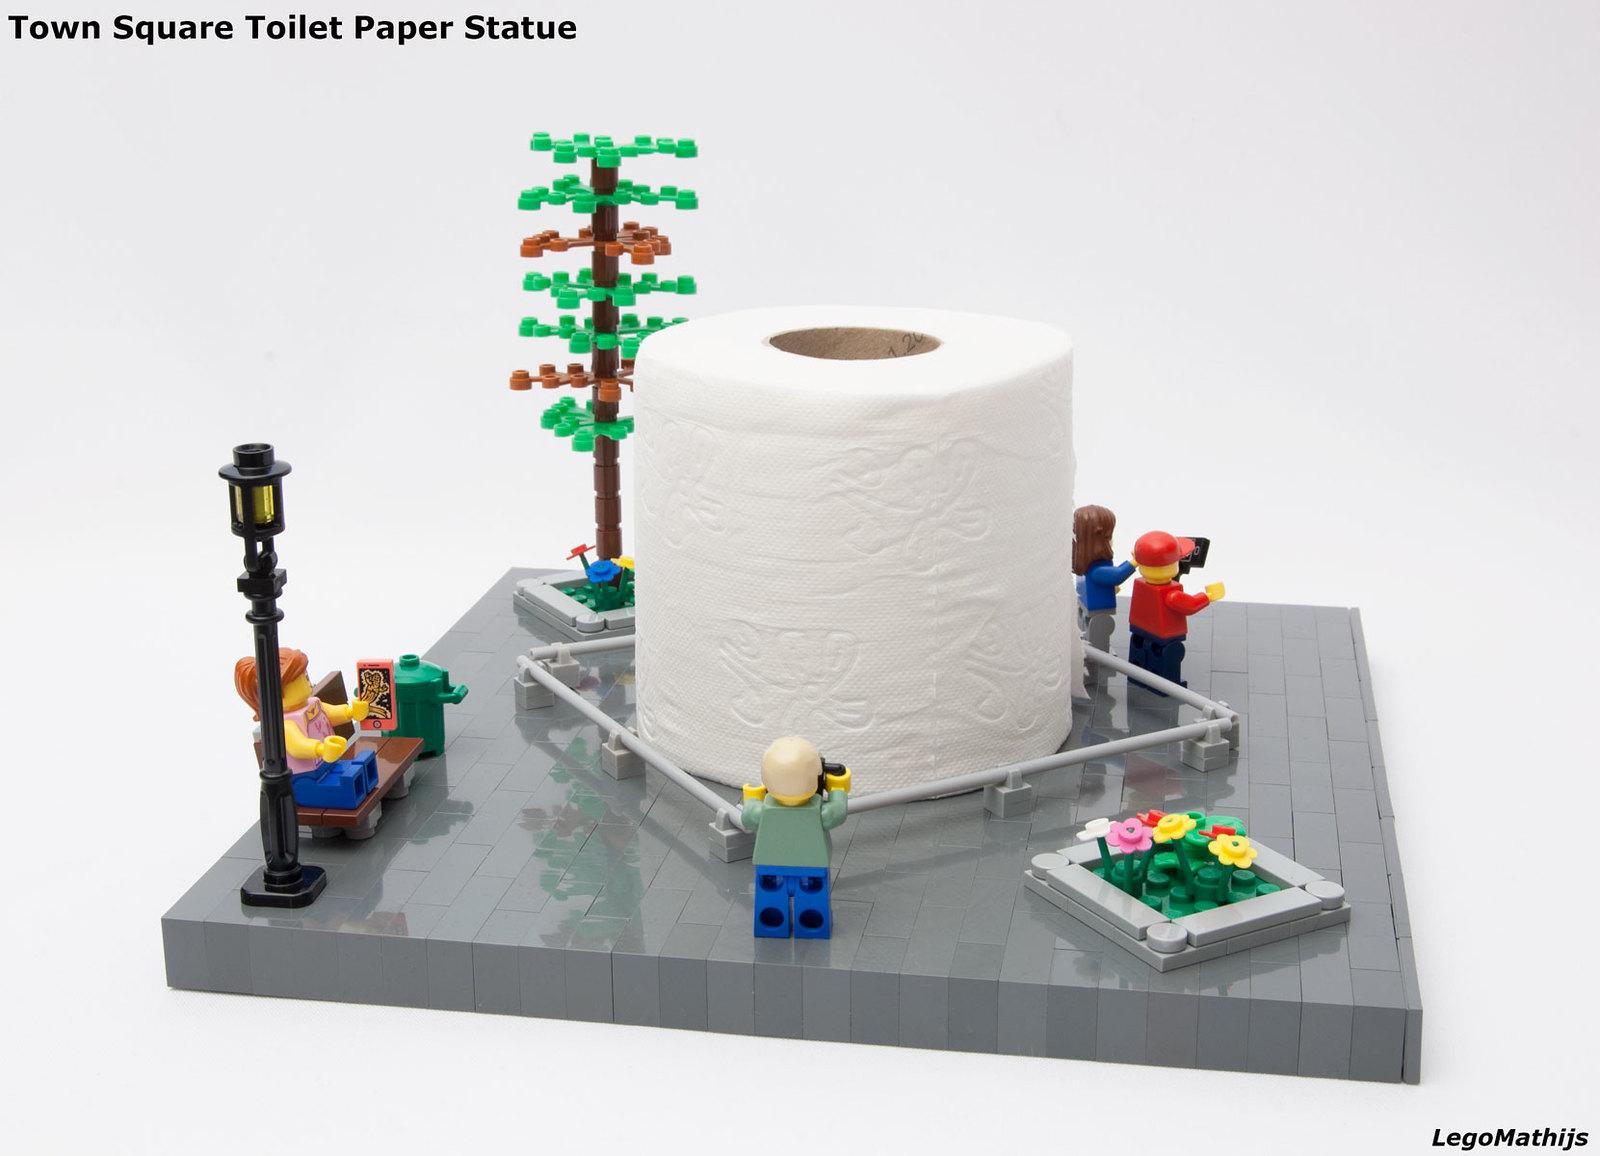 01_Town_Square_Toilet_Paper_Statue